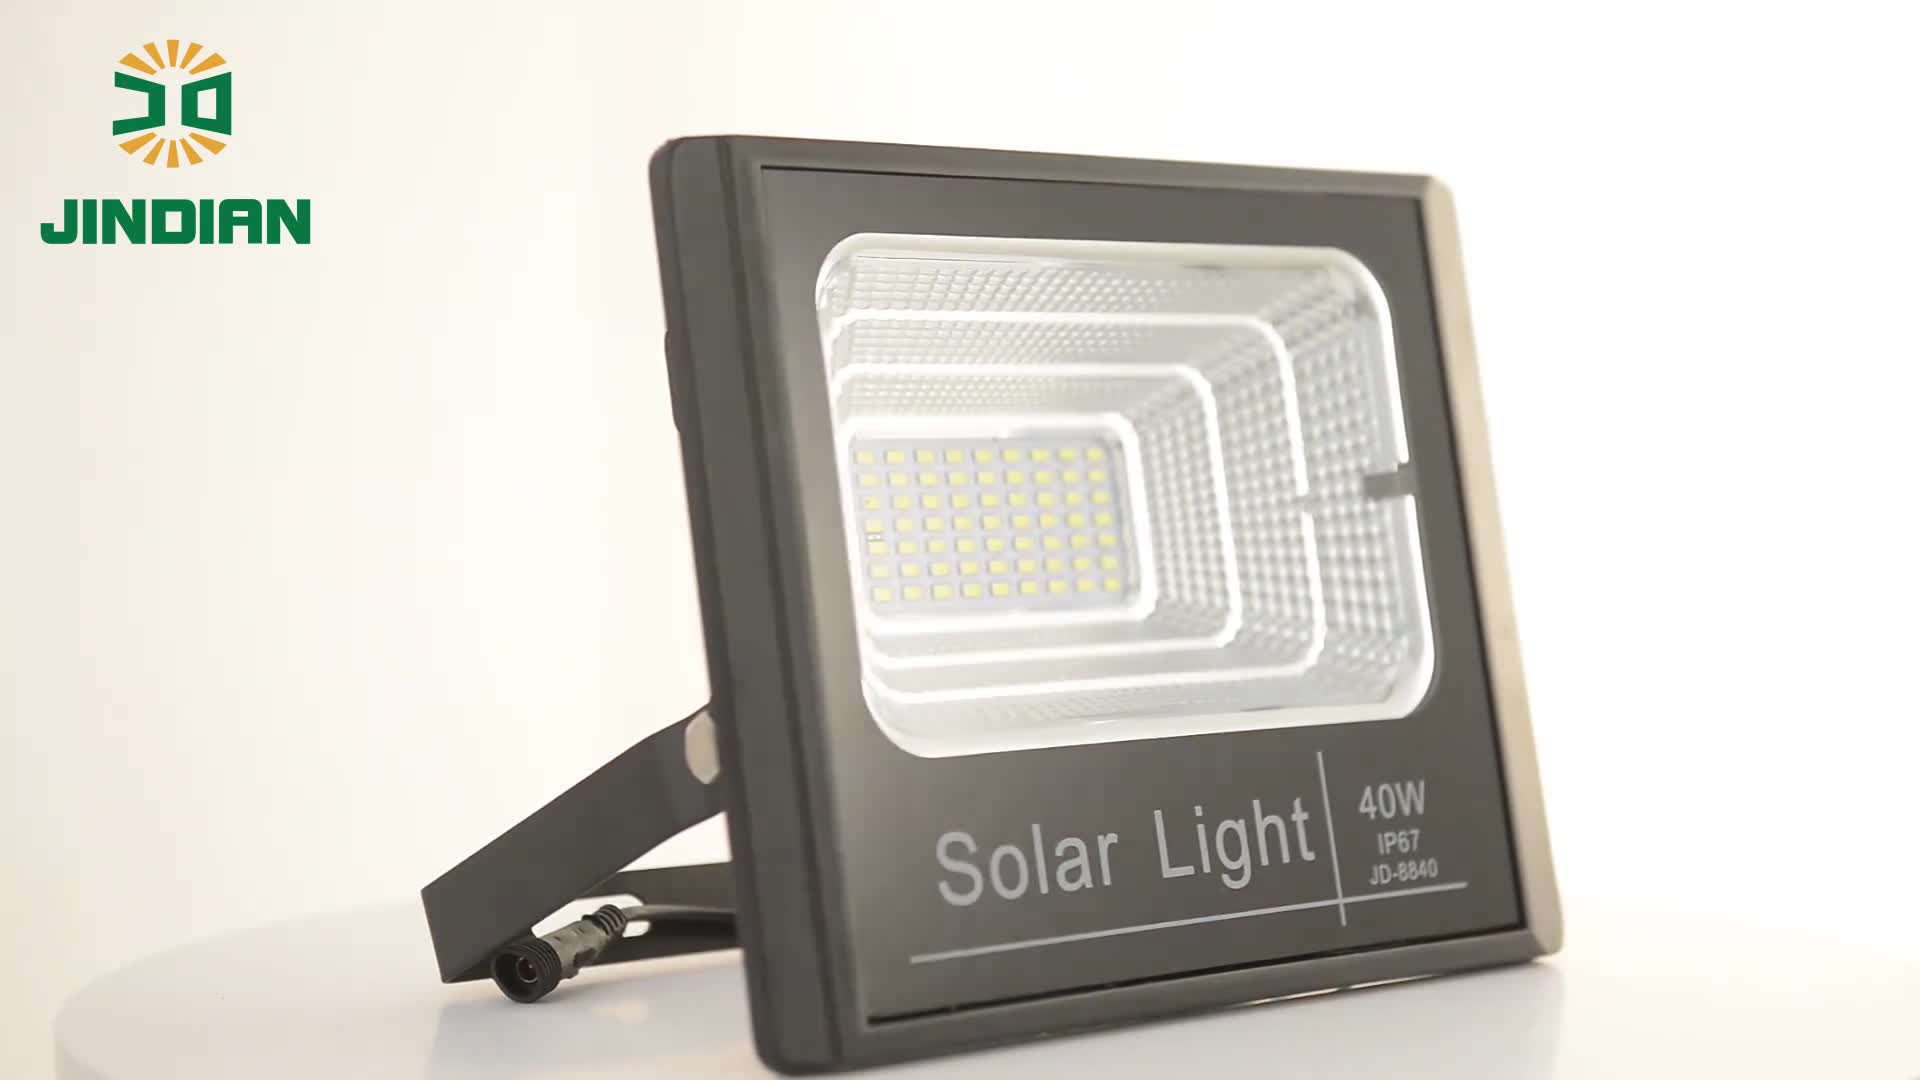 फैक्टरी बिक्री प्रकाश नियंत्रण सौर प्रकाश किट 6 v